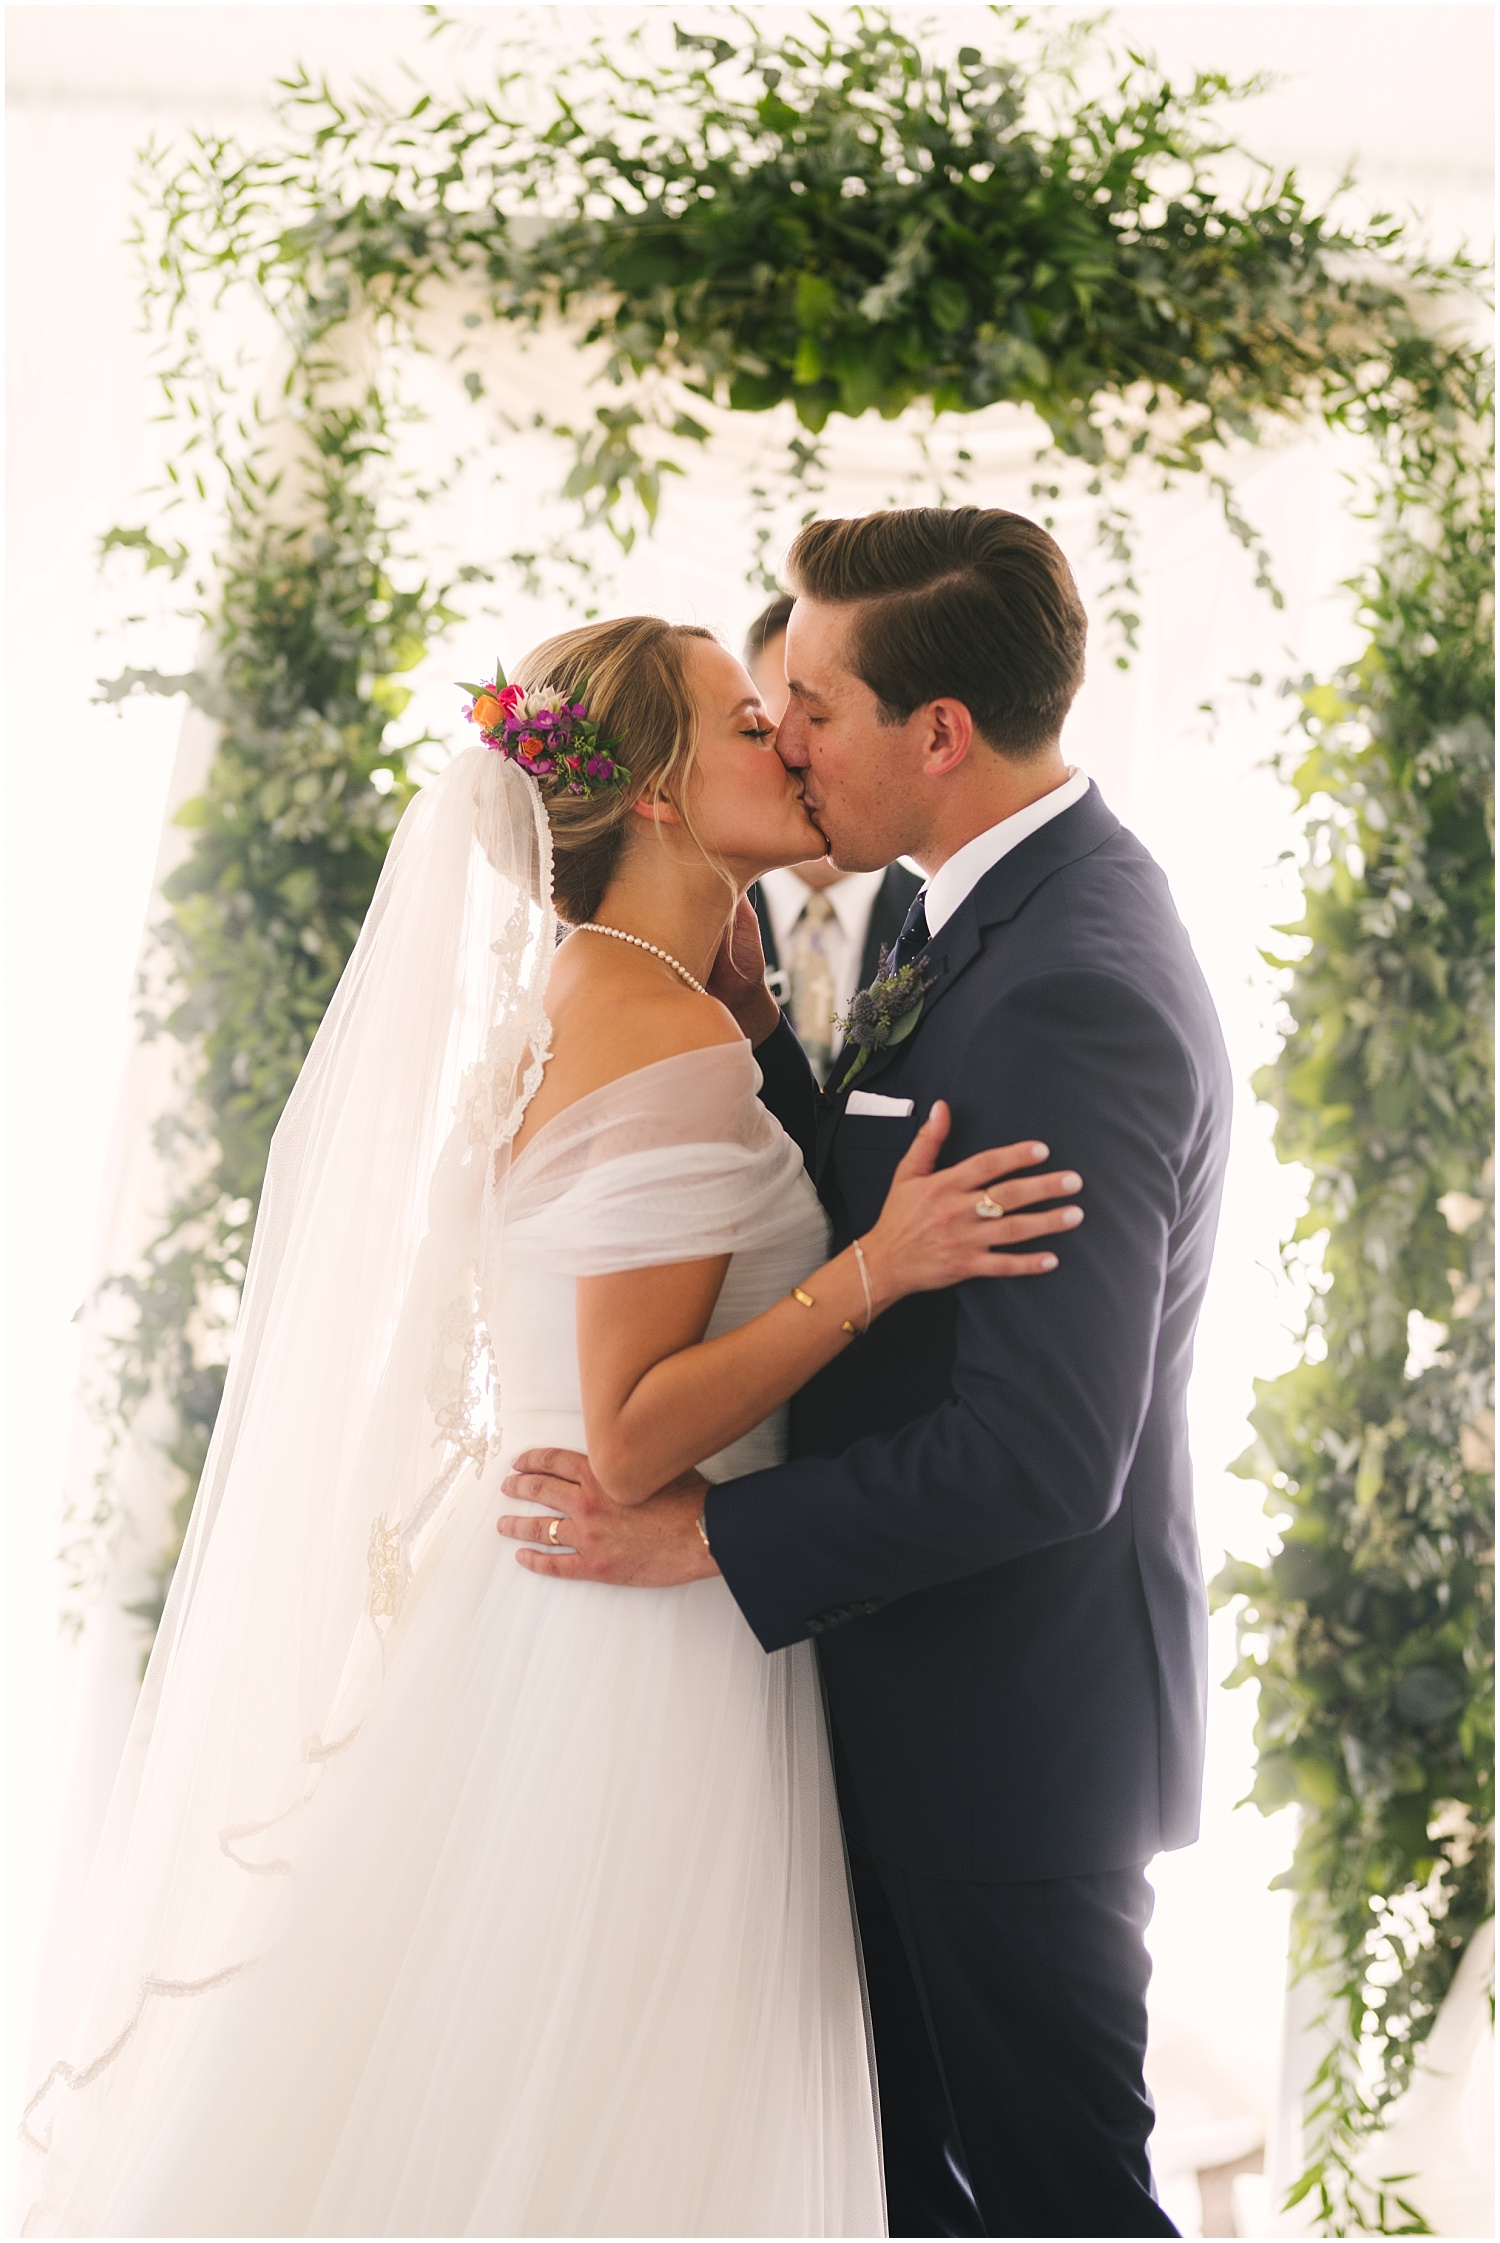 traditions+at+the+glen+wedding+binghamton+wedding (57).jpg